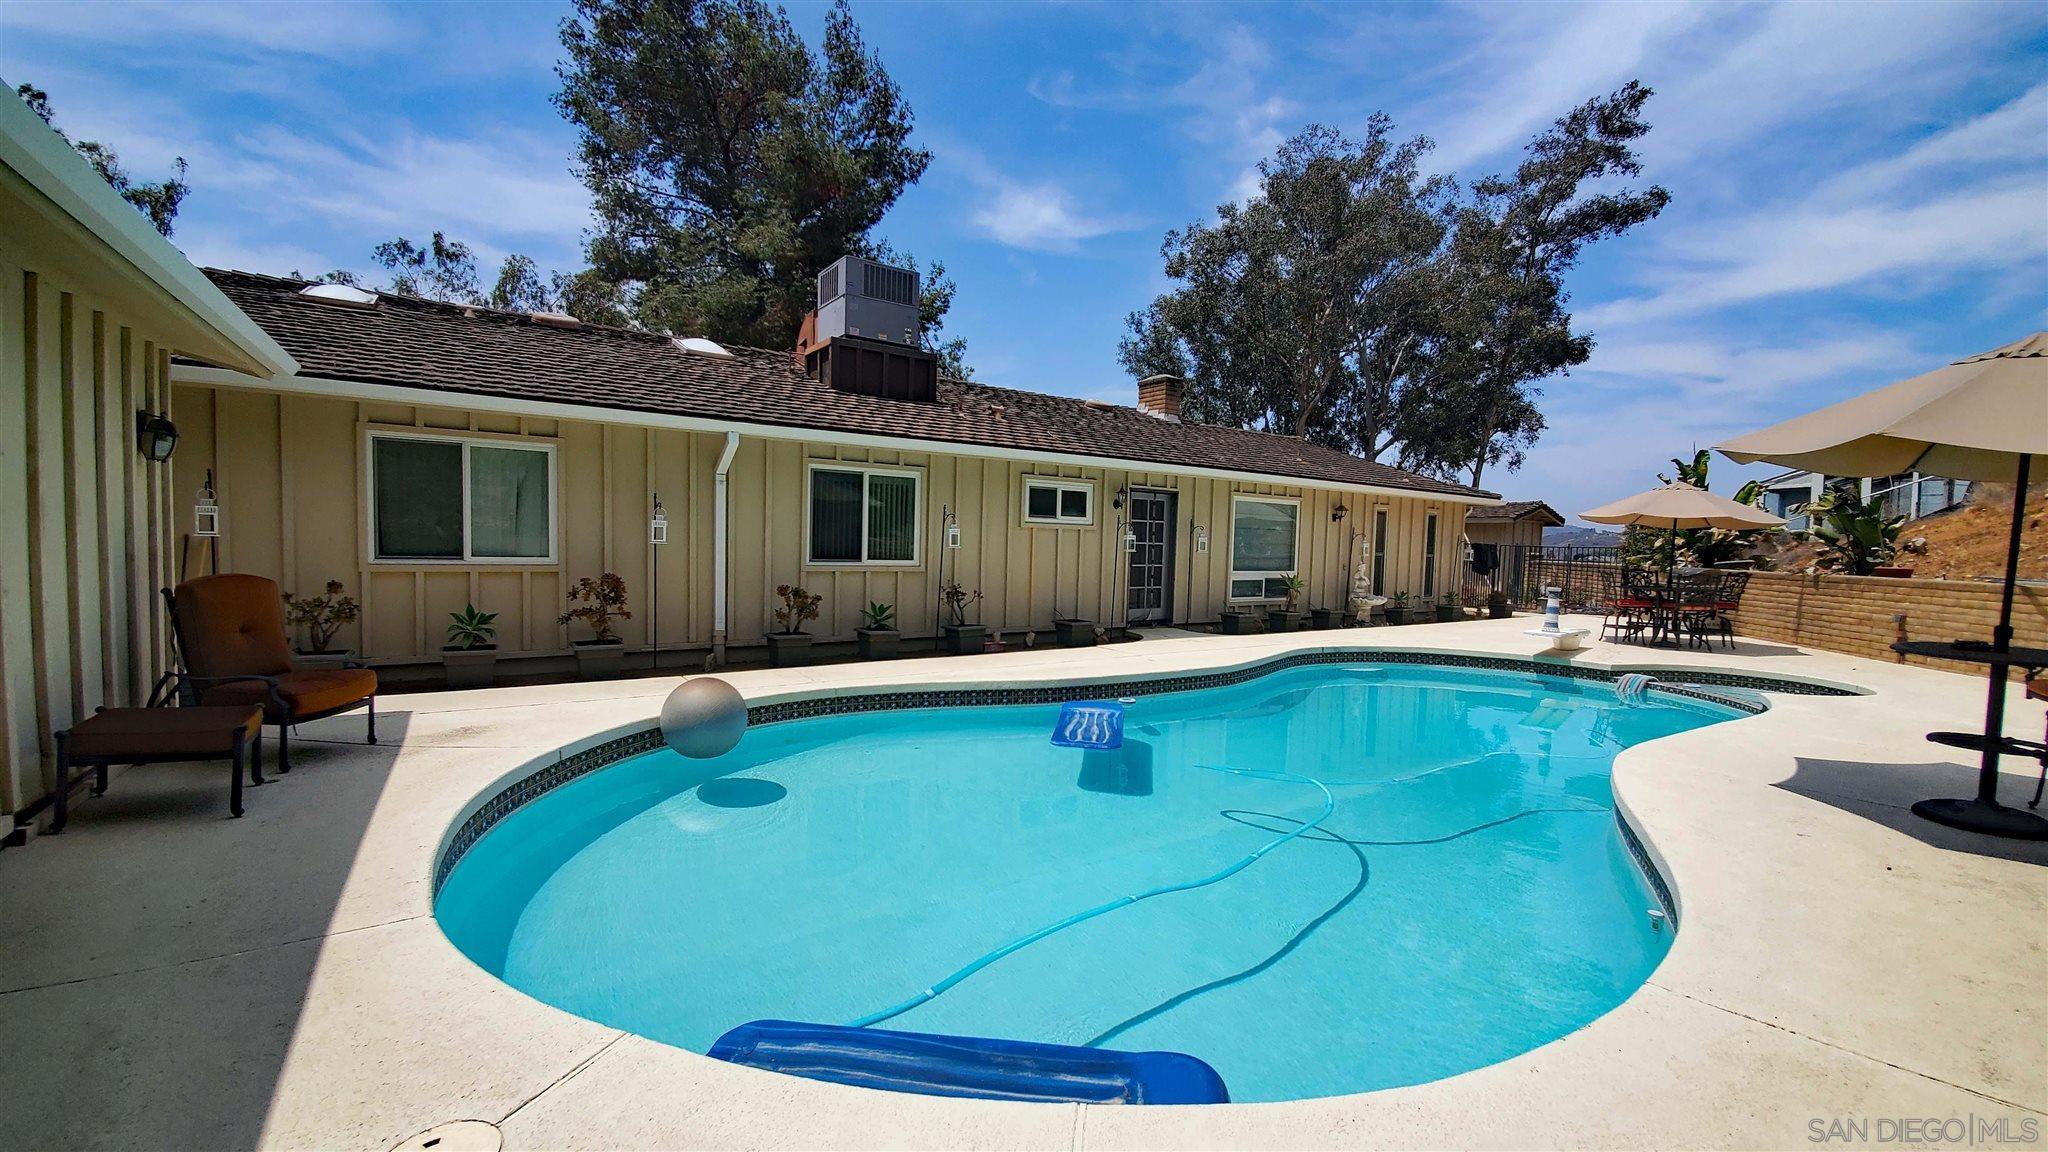 13386 Scotsman Rd, Lakeside, CA 92040